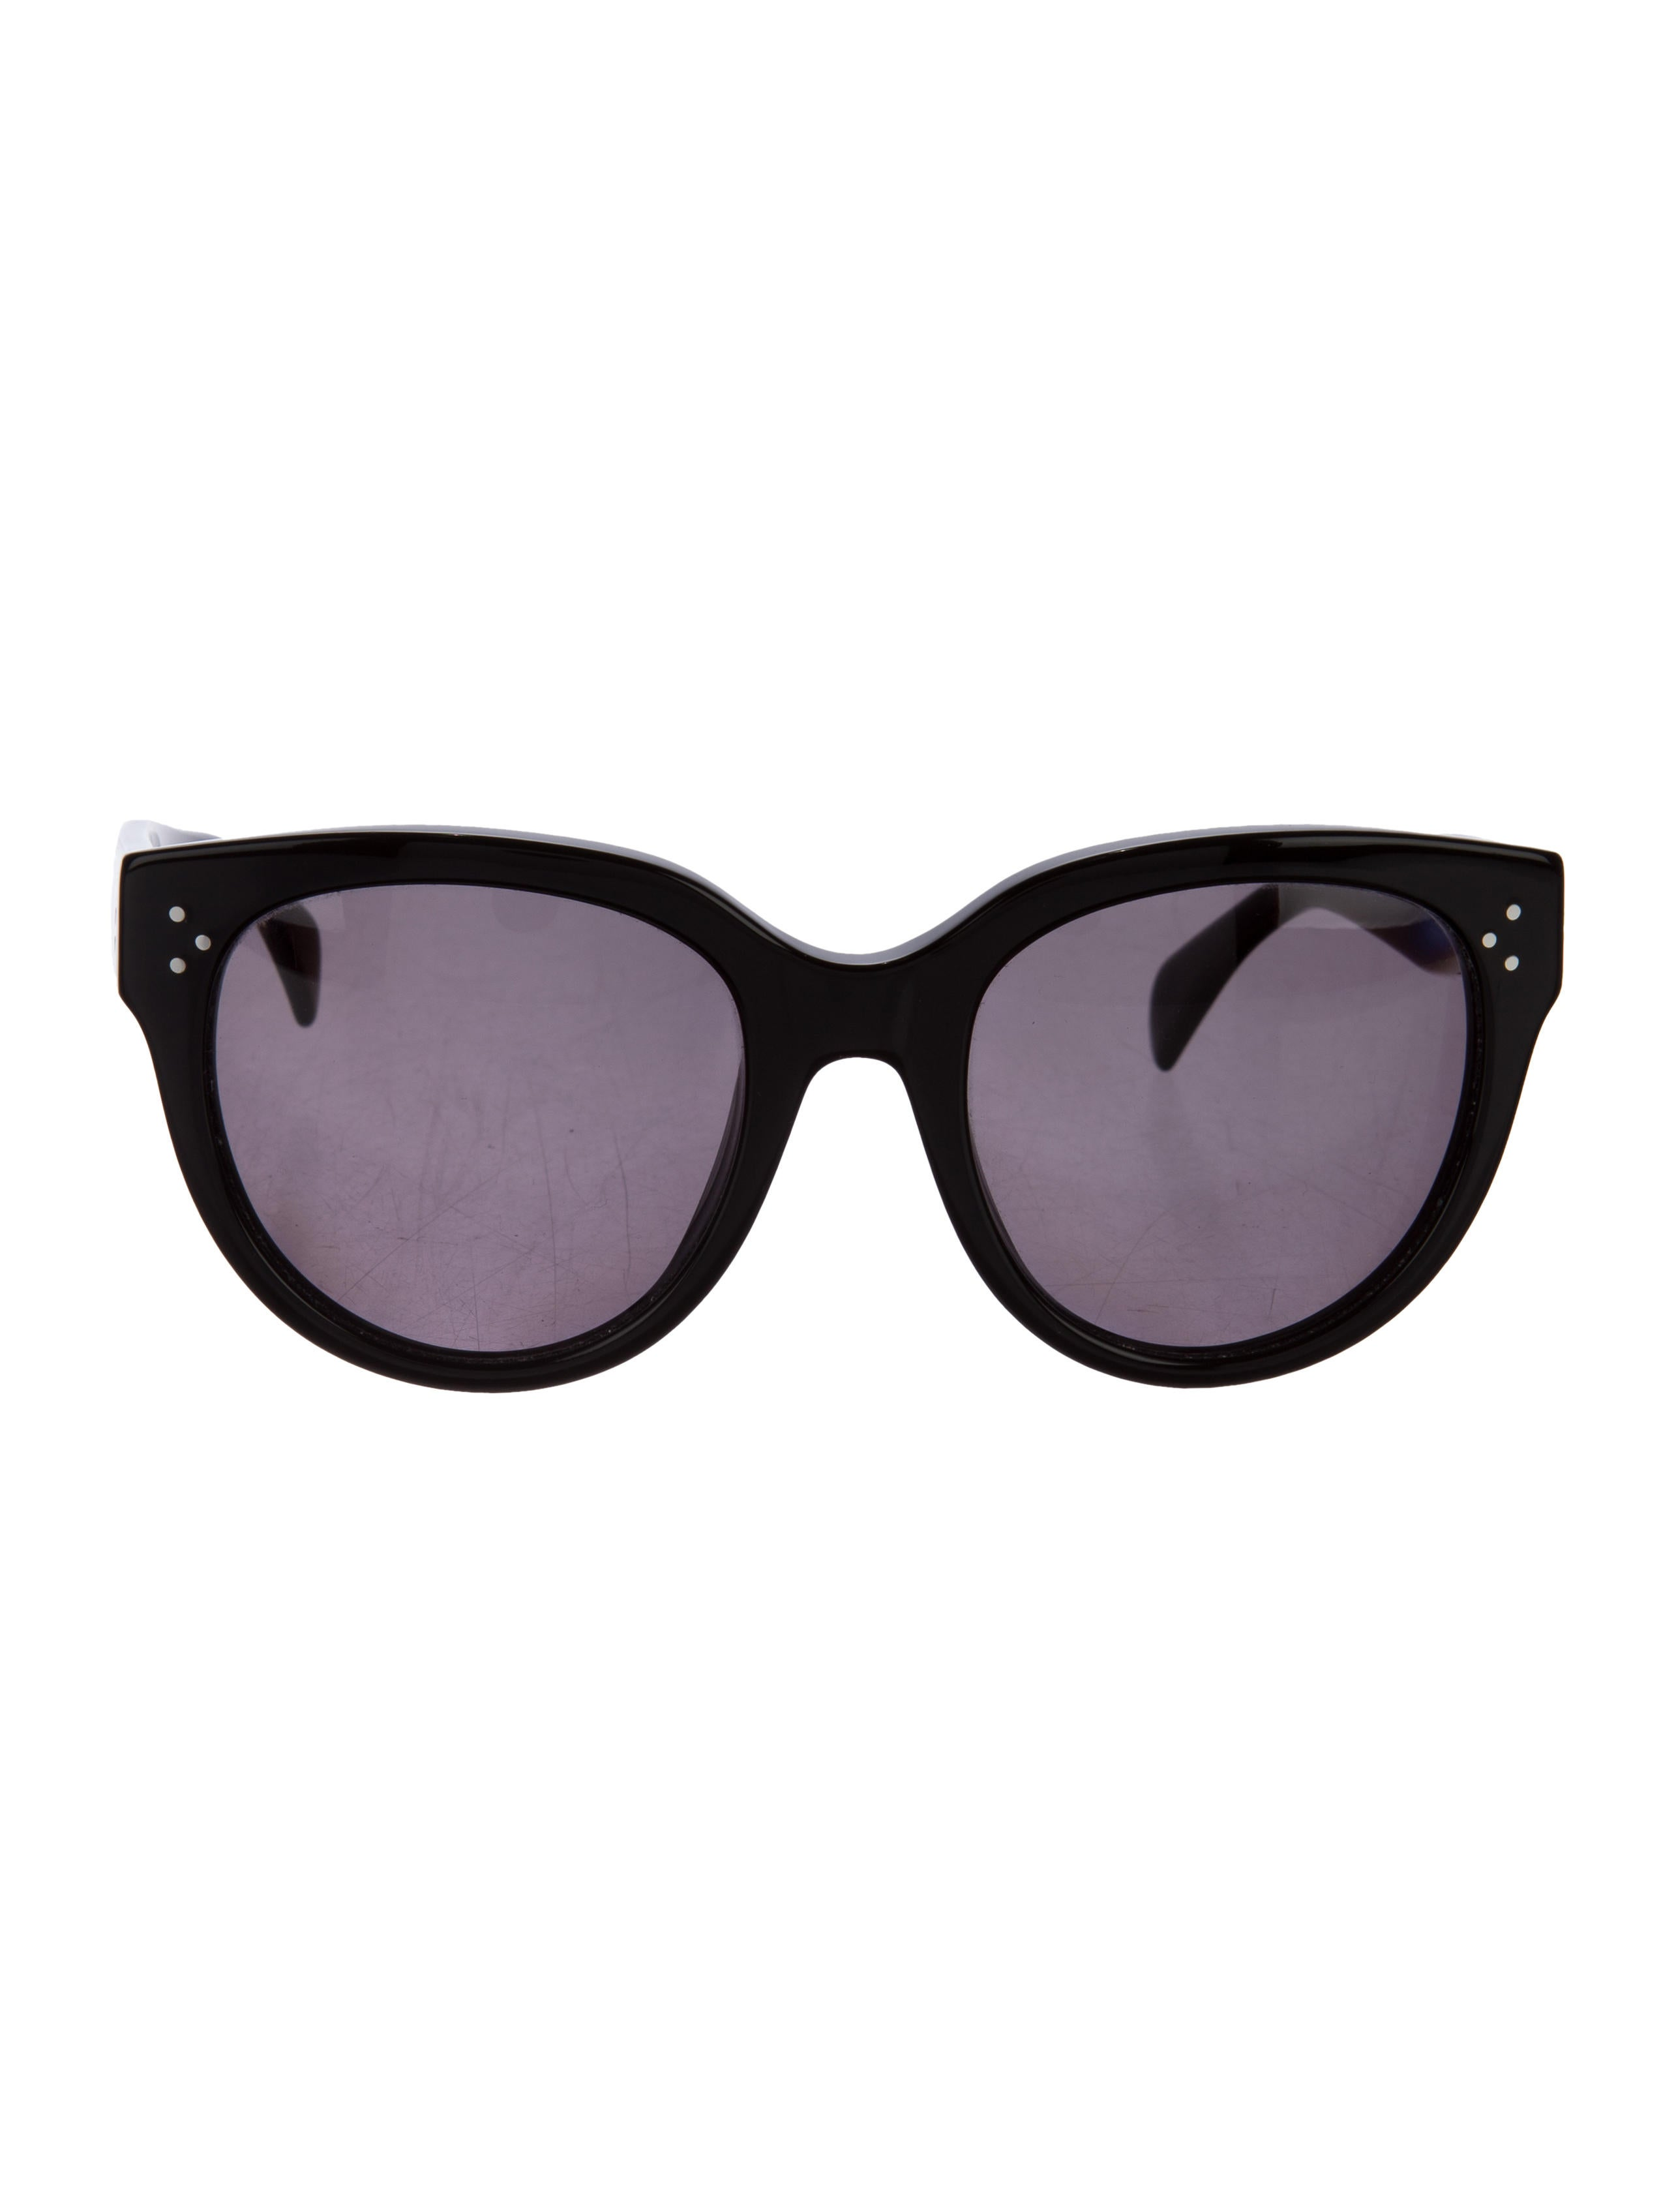 6a65b508a814 Oversized Sunglasses Polarized